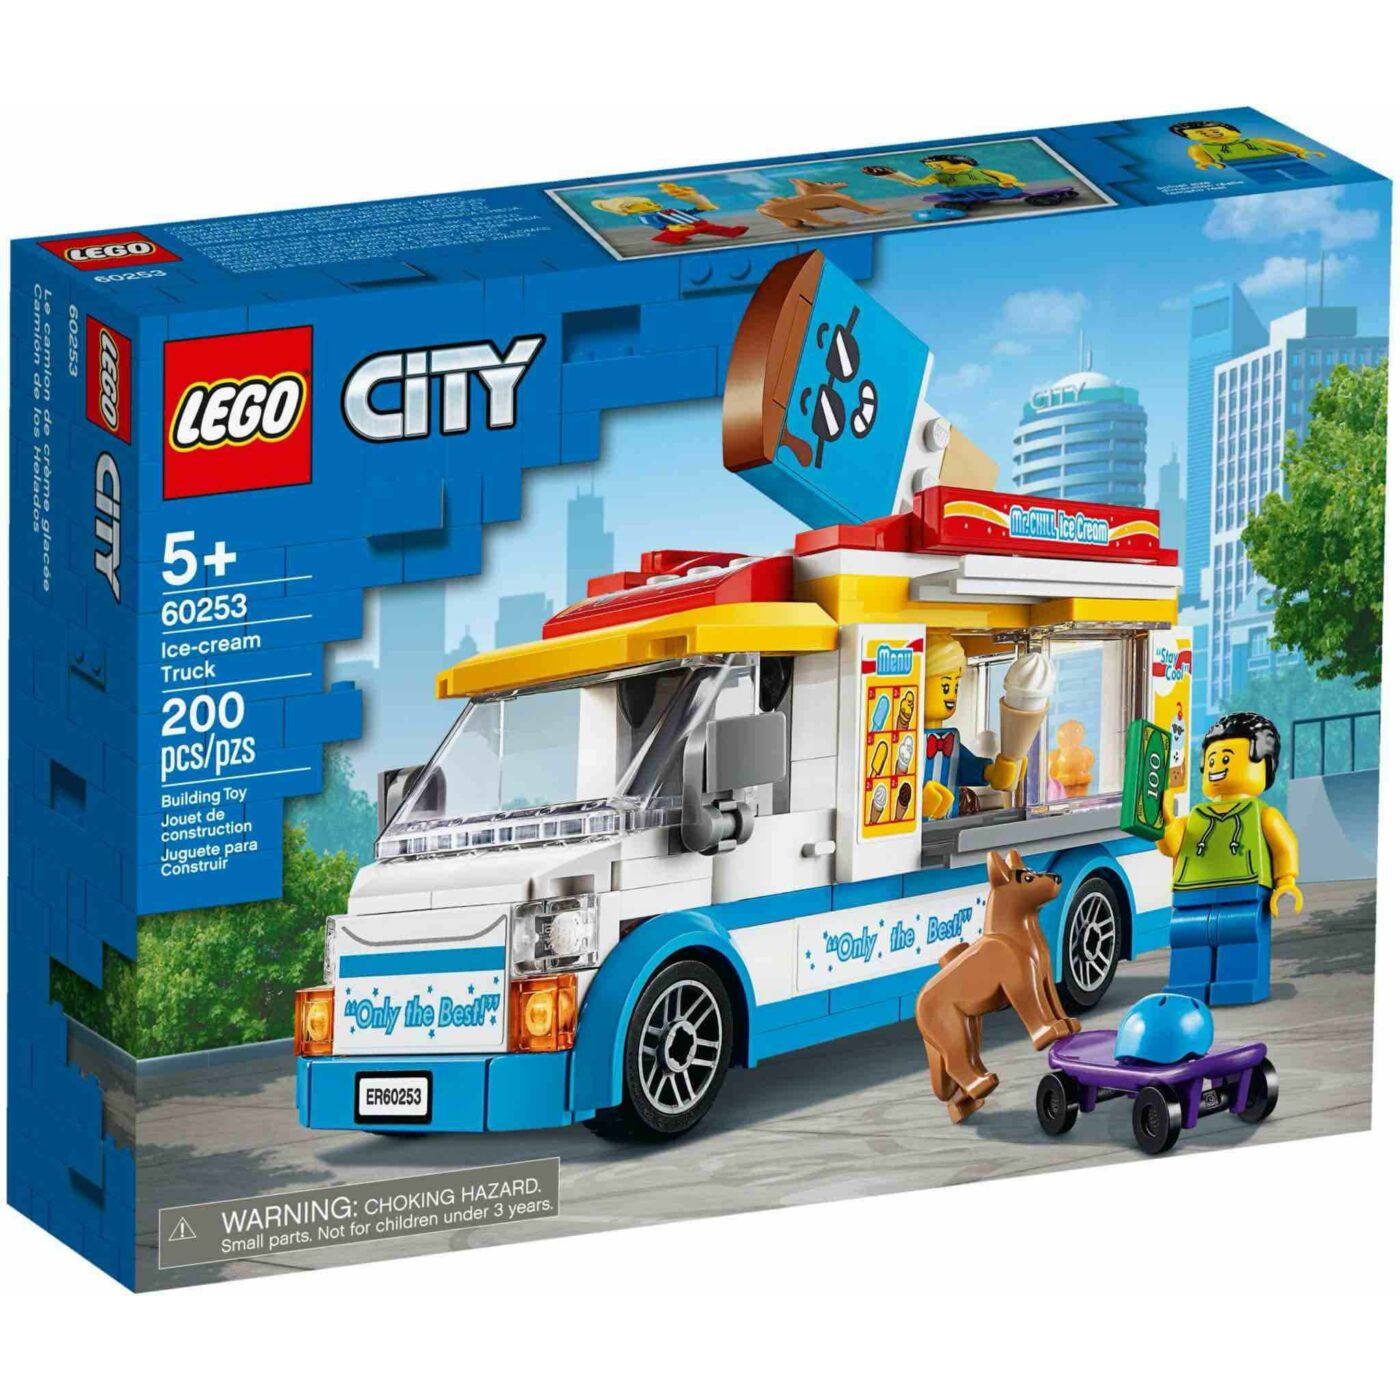 Lego City Fagylaltos kocsi